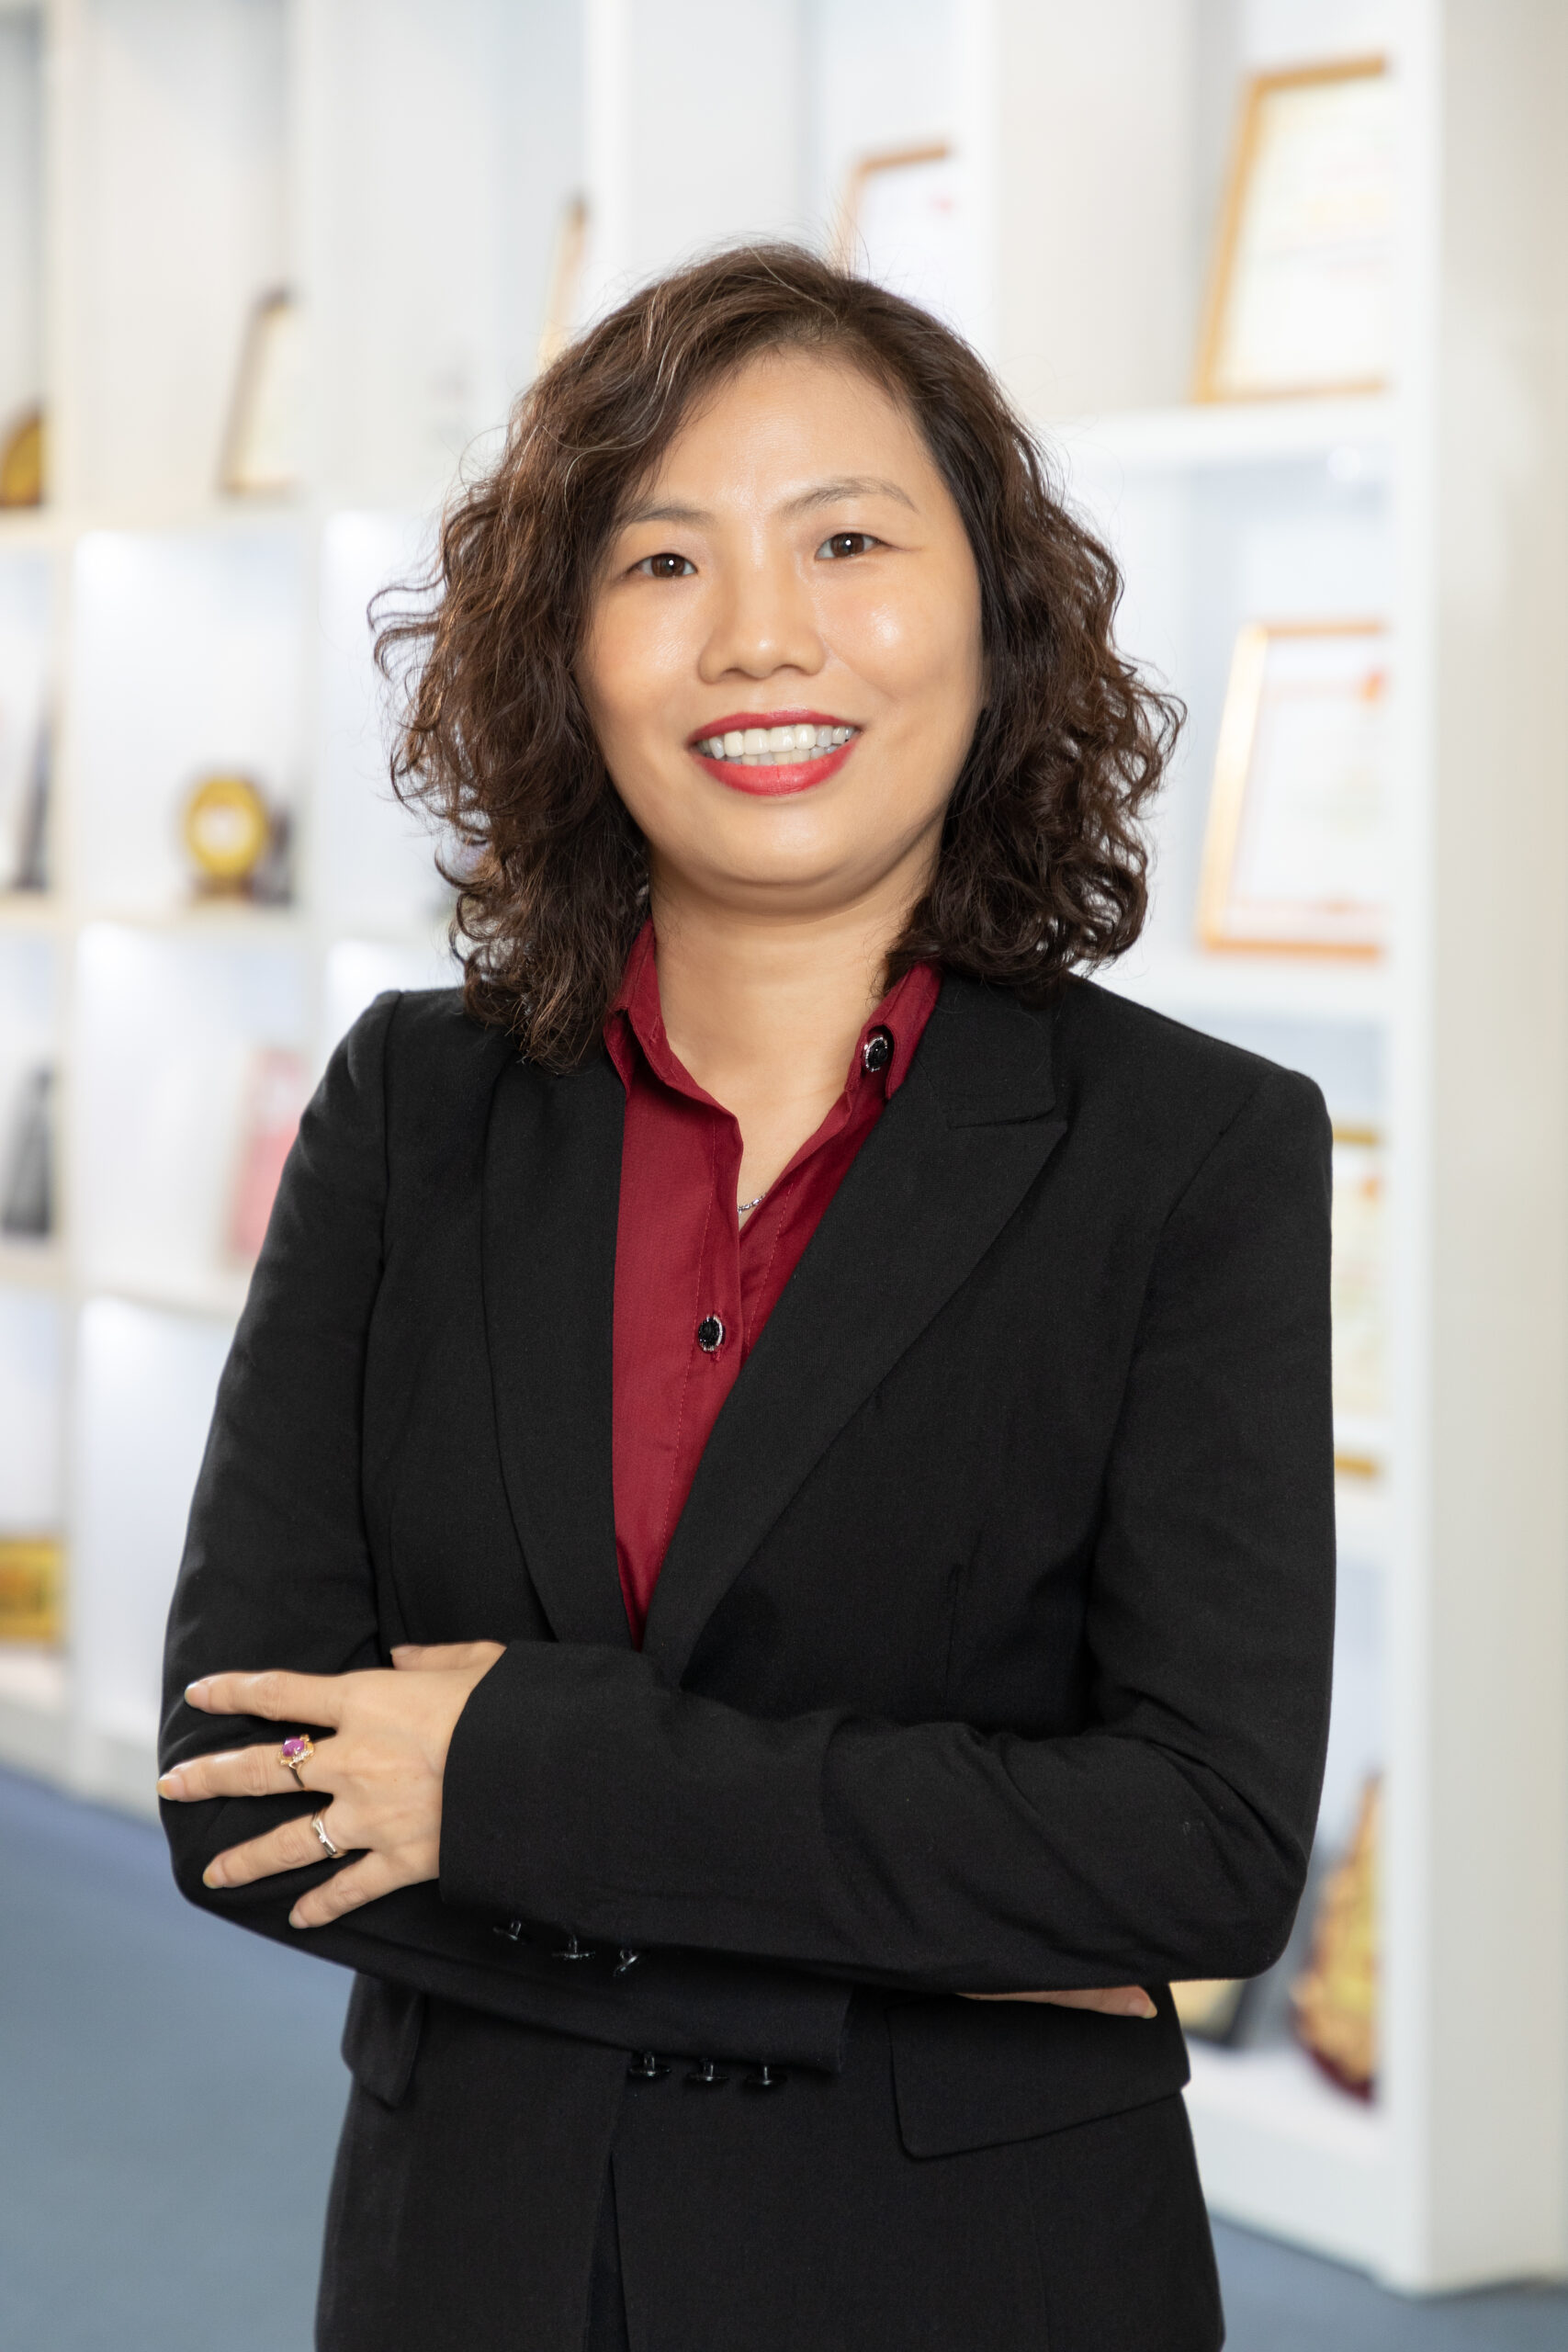 MS NGUYEN MINH HAO